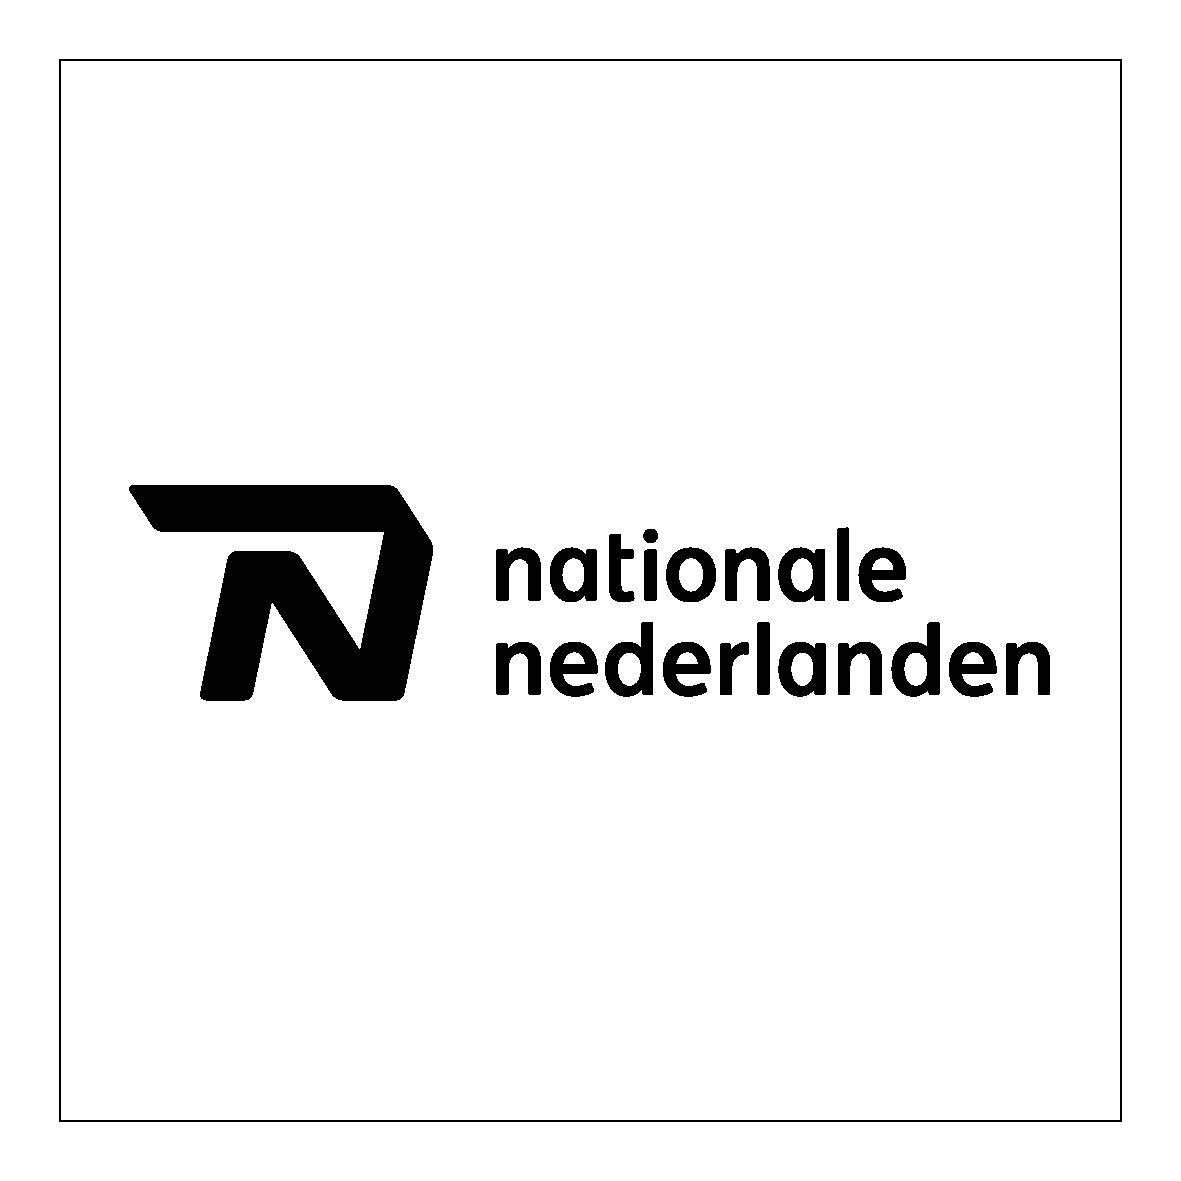 Logos_Klanten9.jpg